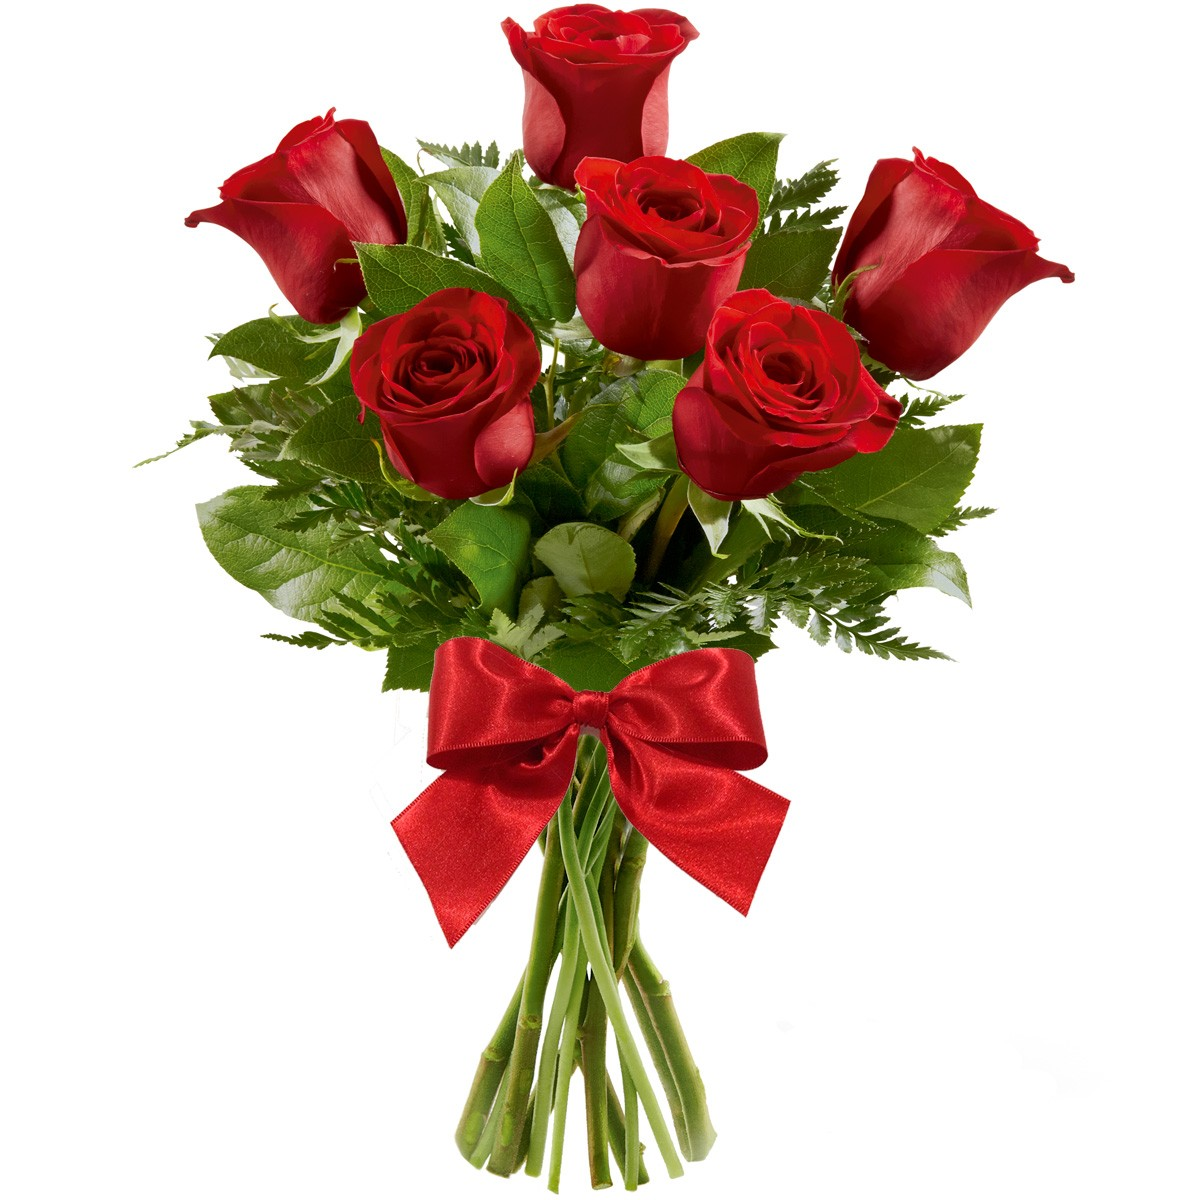 Vases Ramalhete Com 6 Rosas